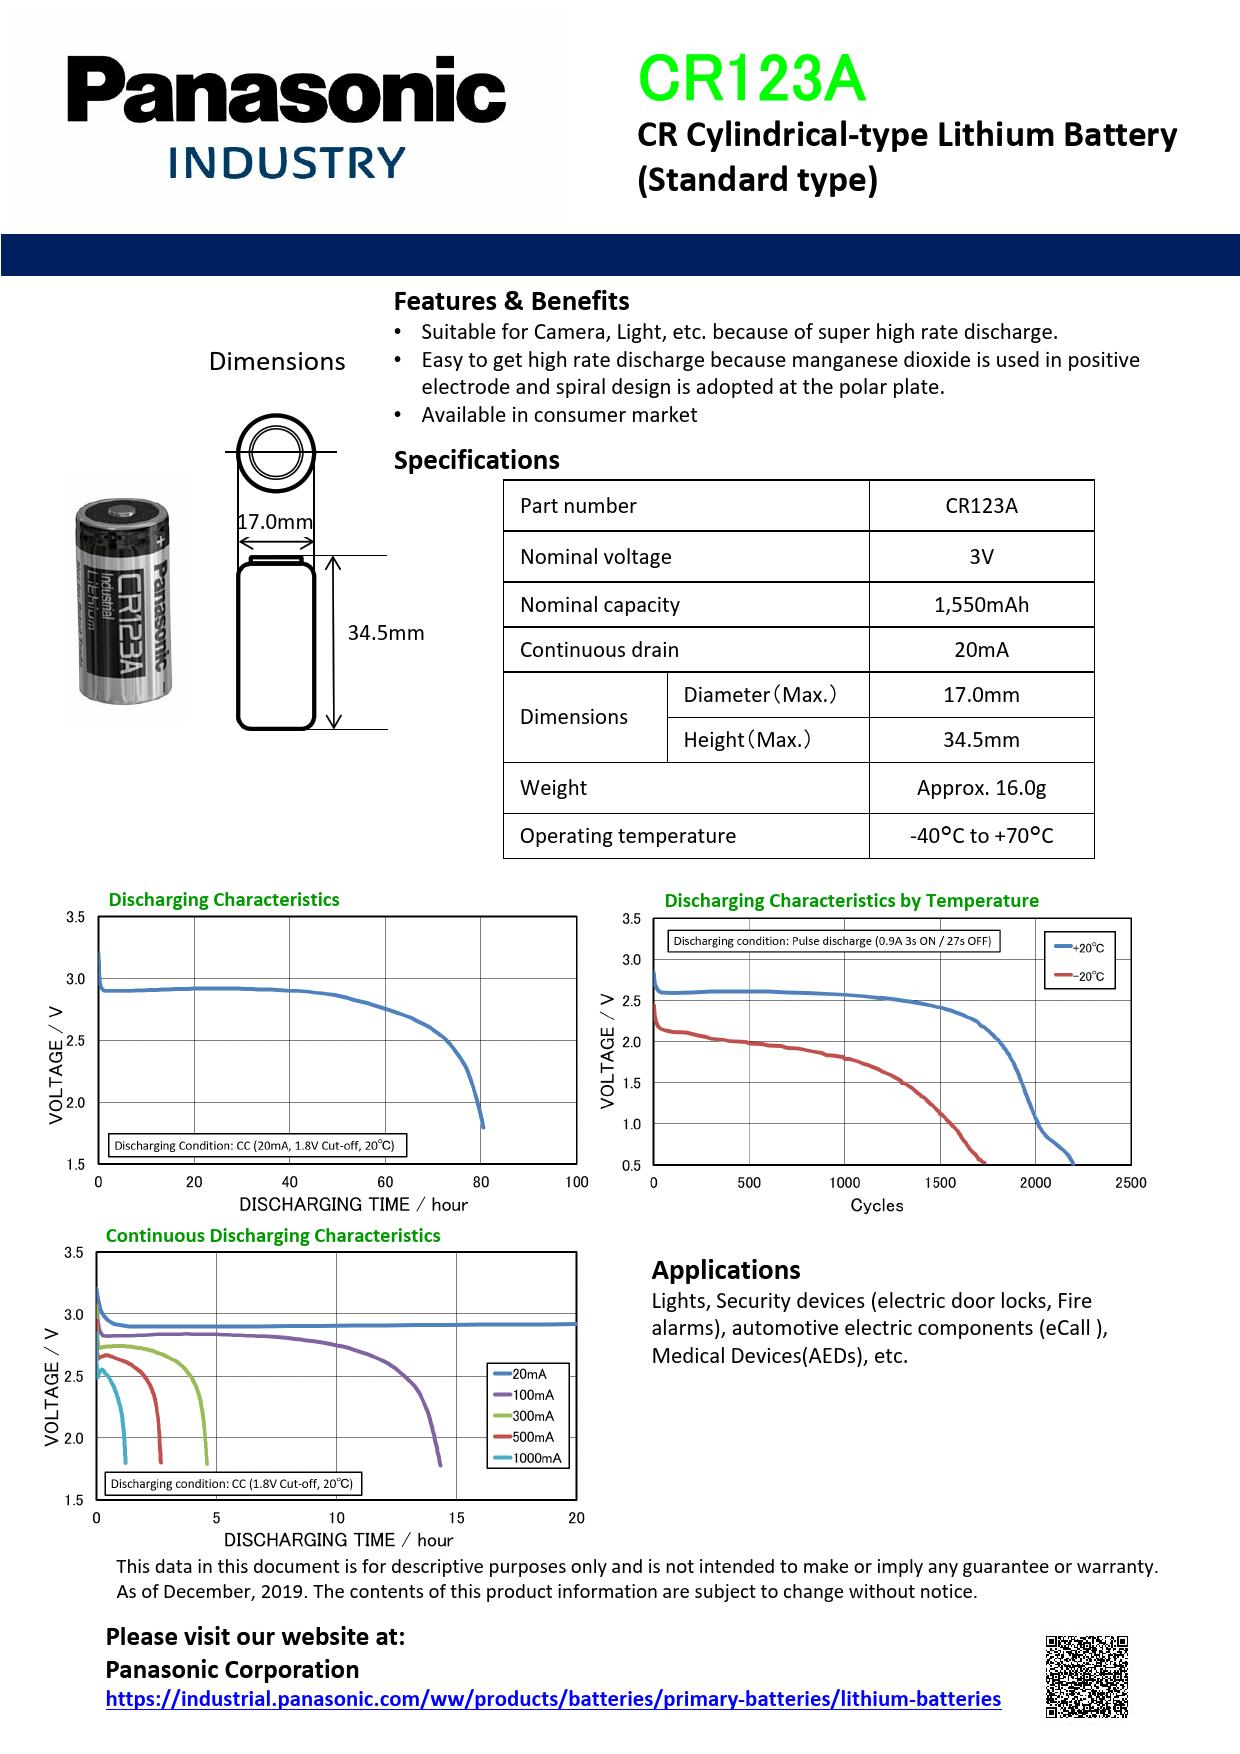 Datasheet CR123A Panasonic